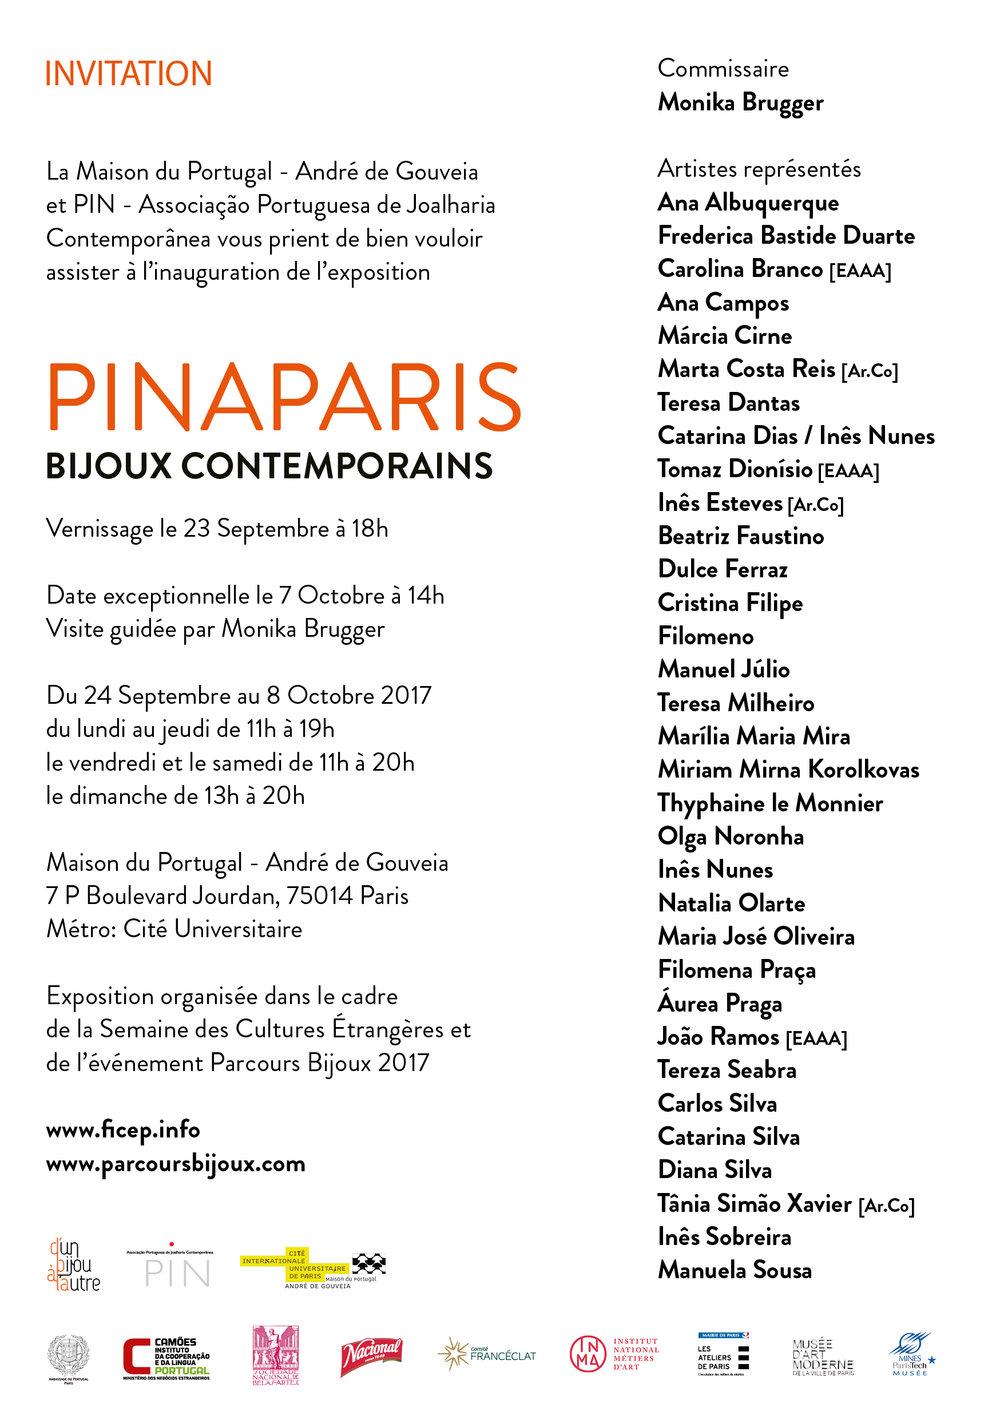 PINAPARIS_CONVITE_VERSO.jpg